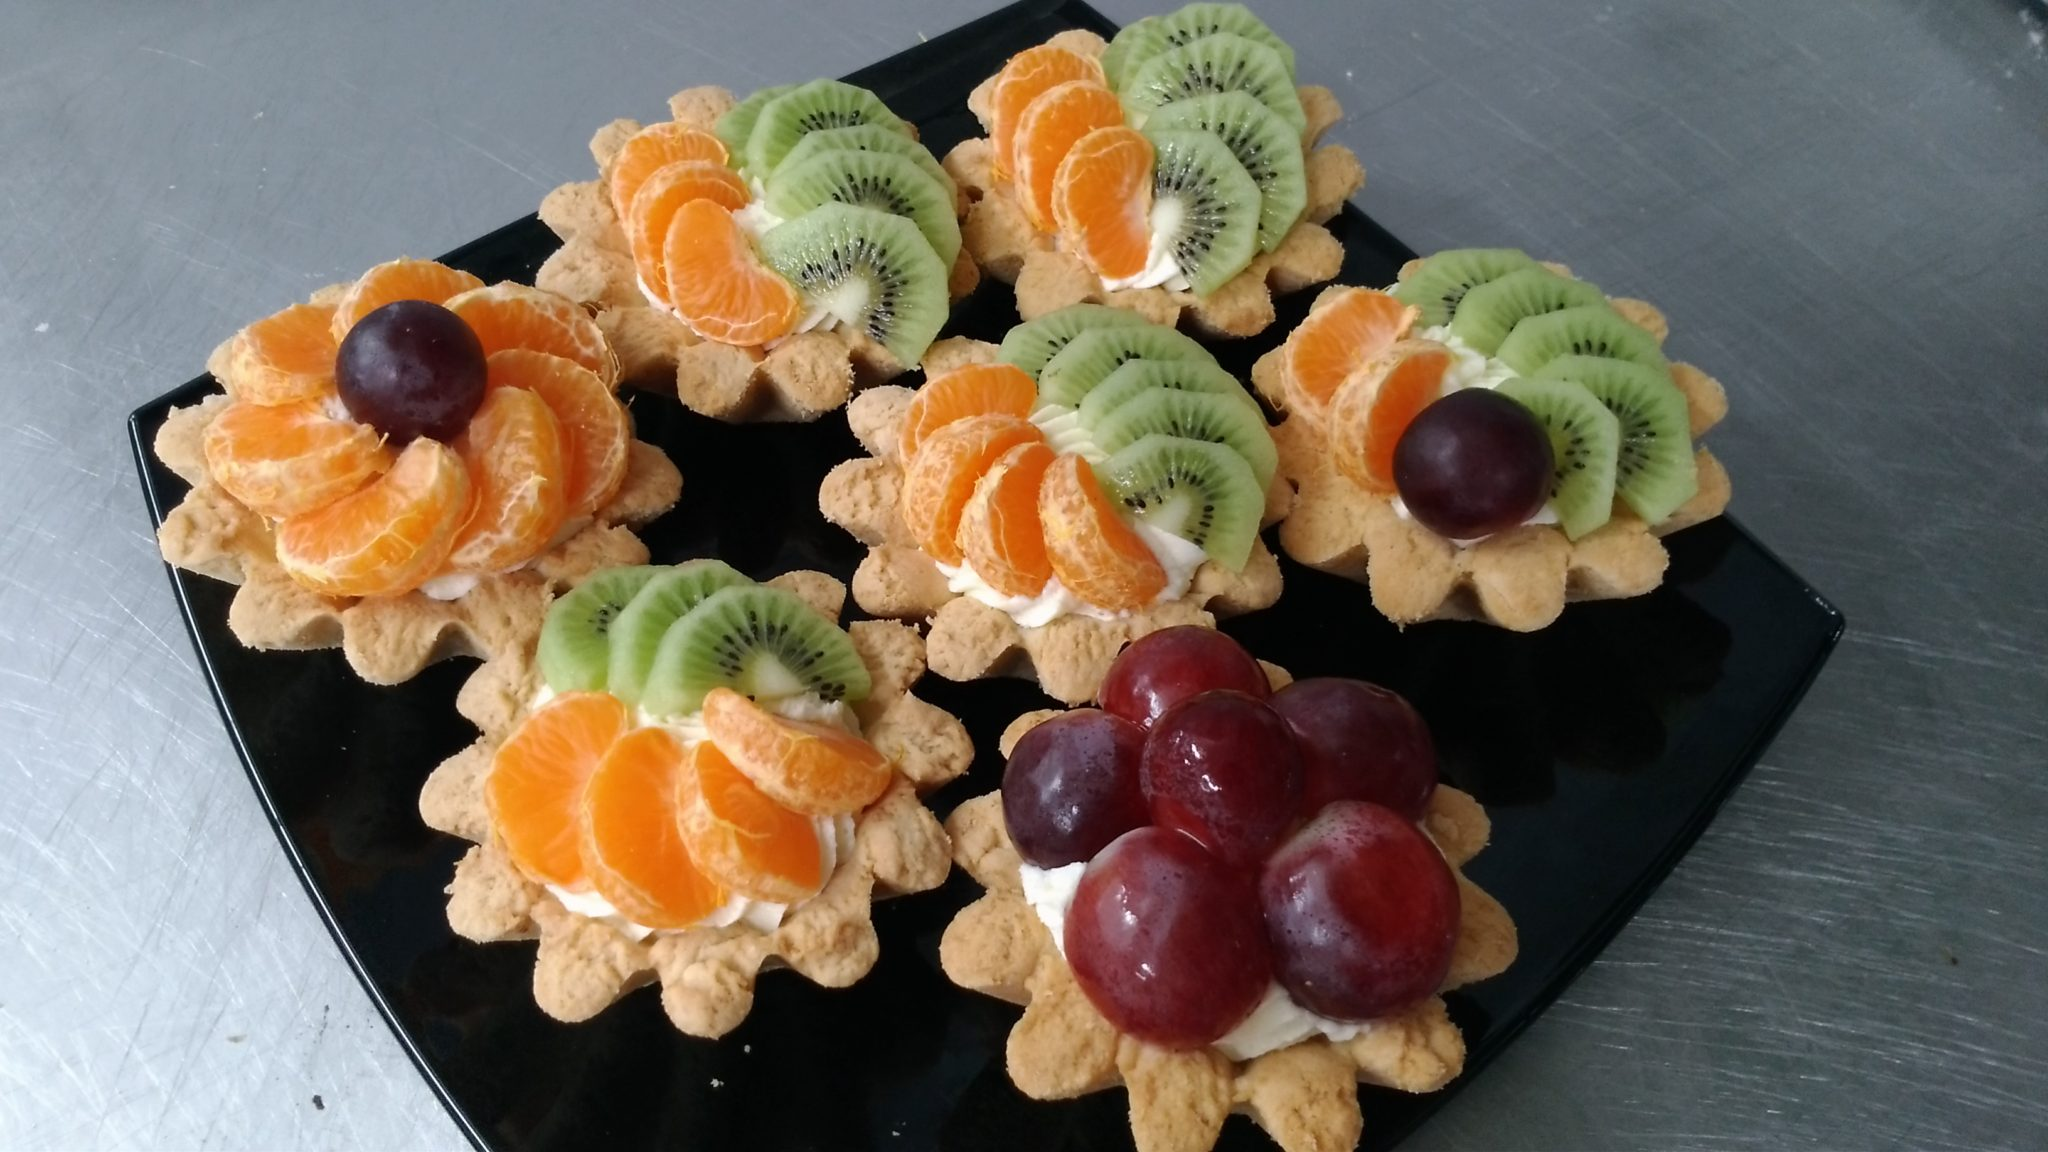 Корзиночка со сливками и фруктами